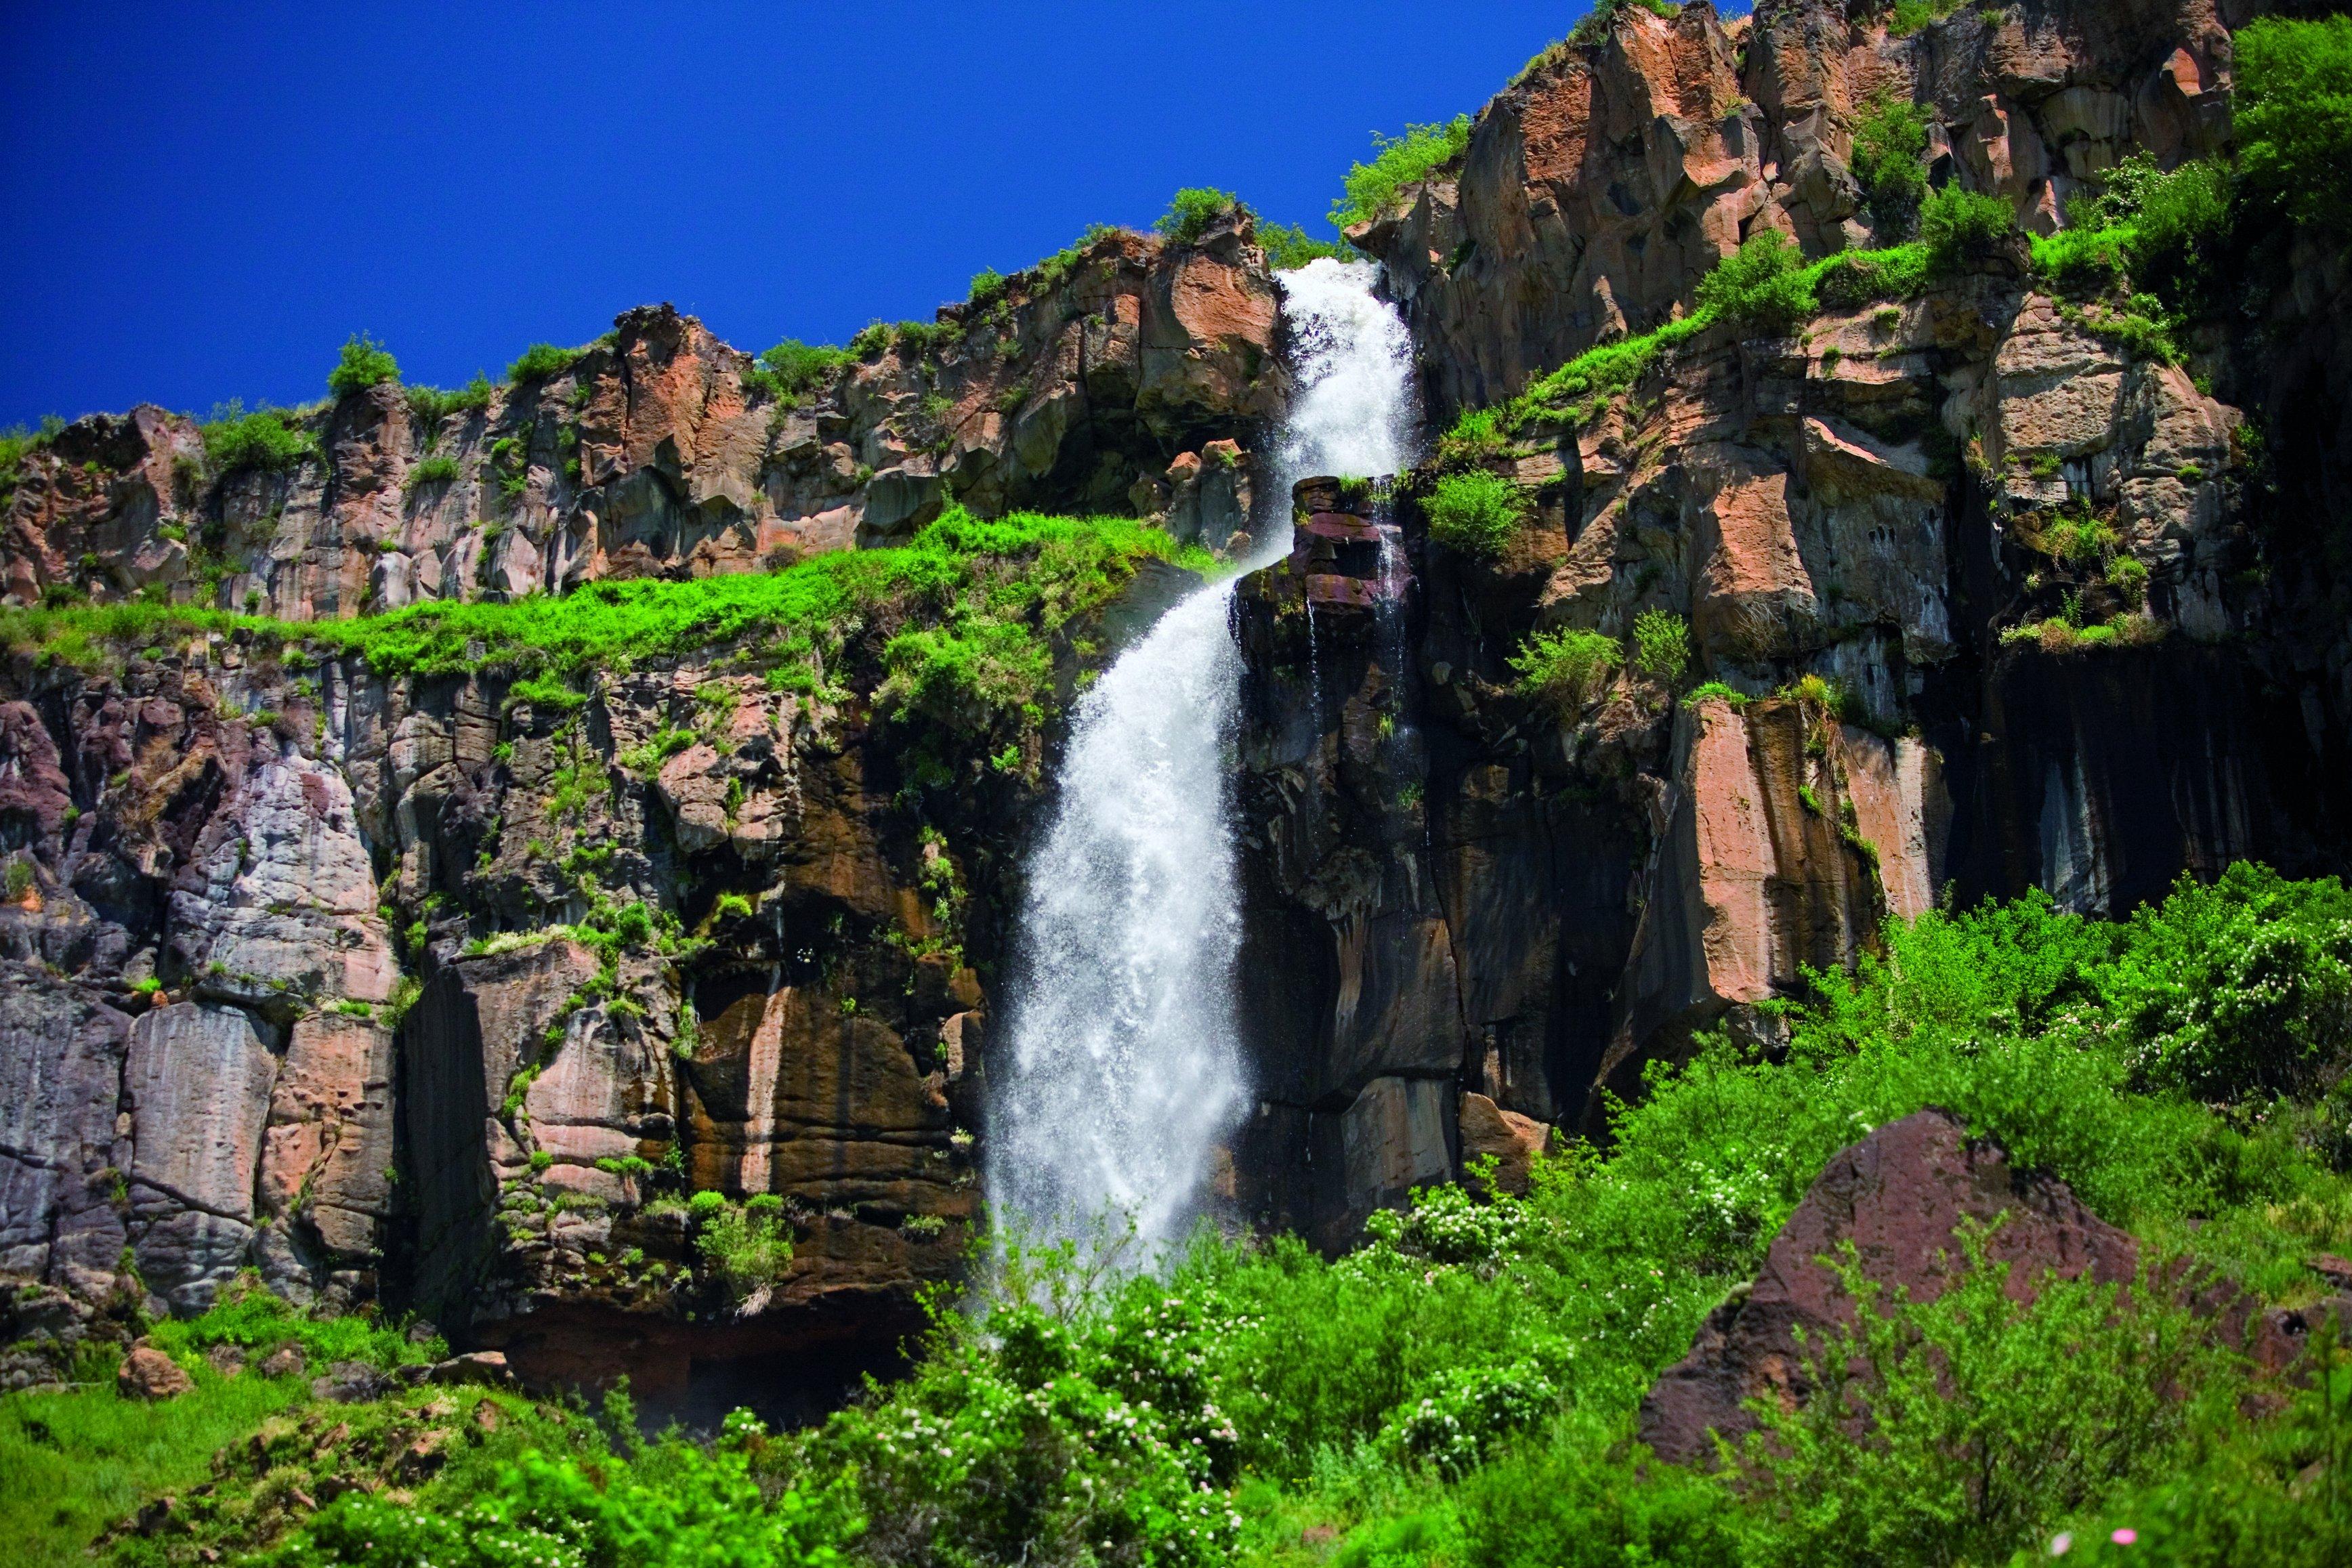 Kasagh waterfall